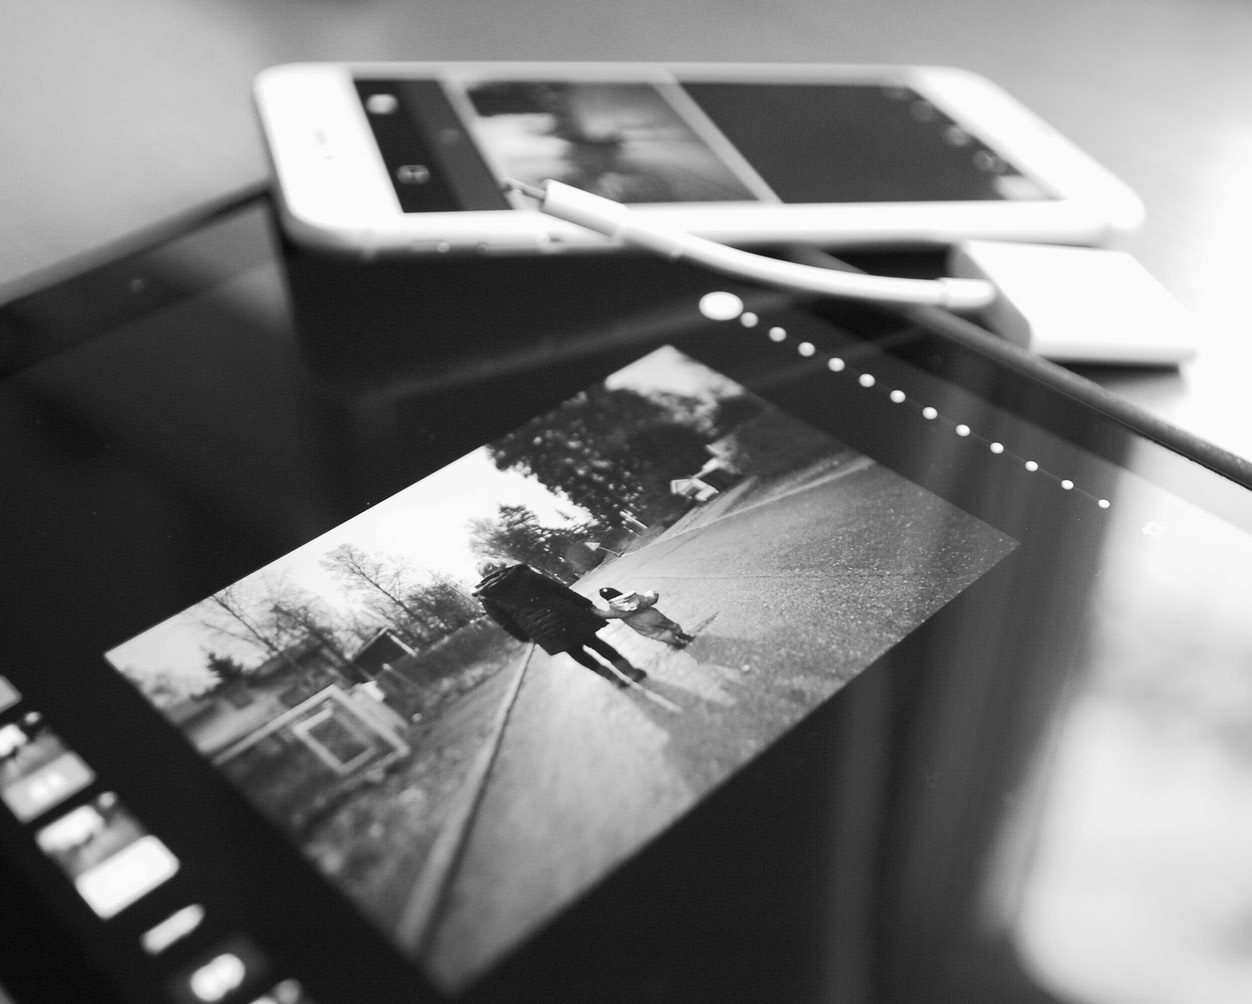 IPhoneBlog de VSCO Cam